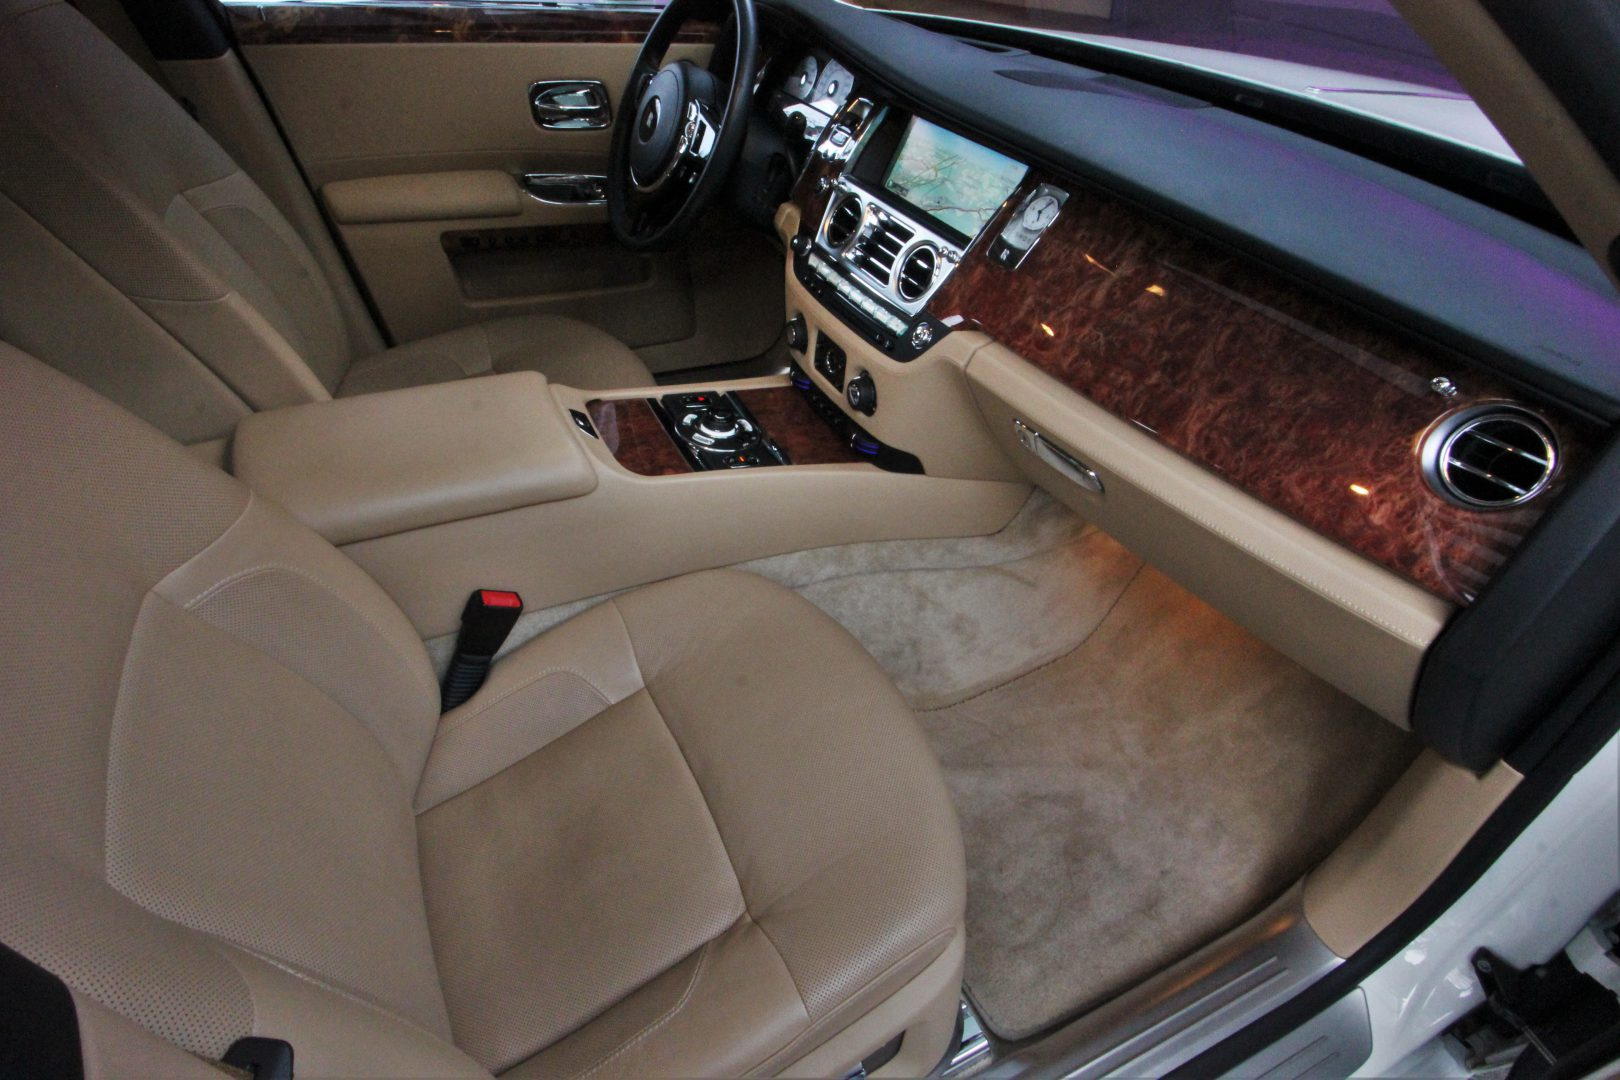 AIL Rolls Royce Ghost 6.6 V12  1